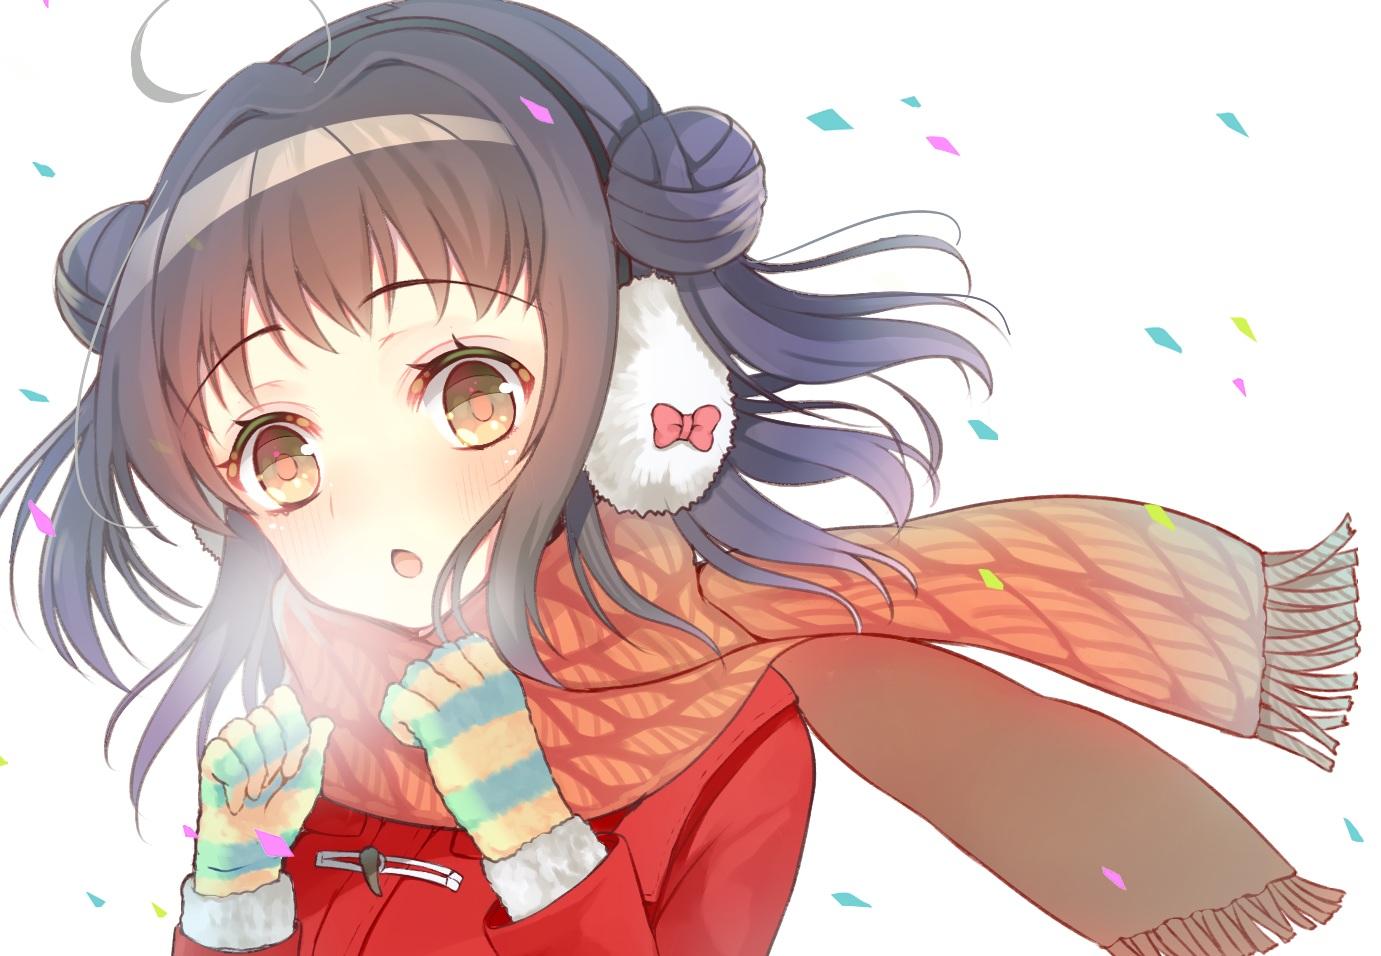 anthropomorphism aozora_nan earmuffs gloves kantai_collection naka_(kancolle) scarf